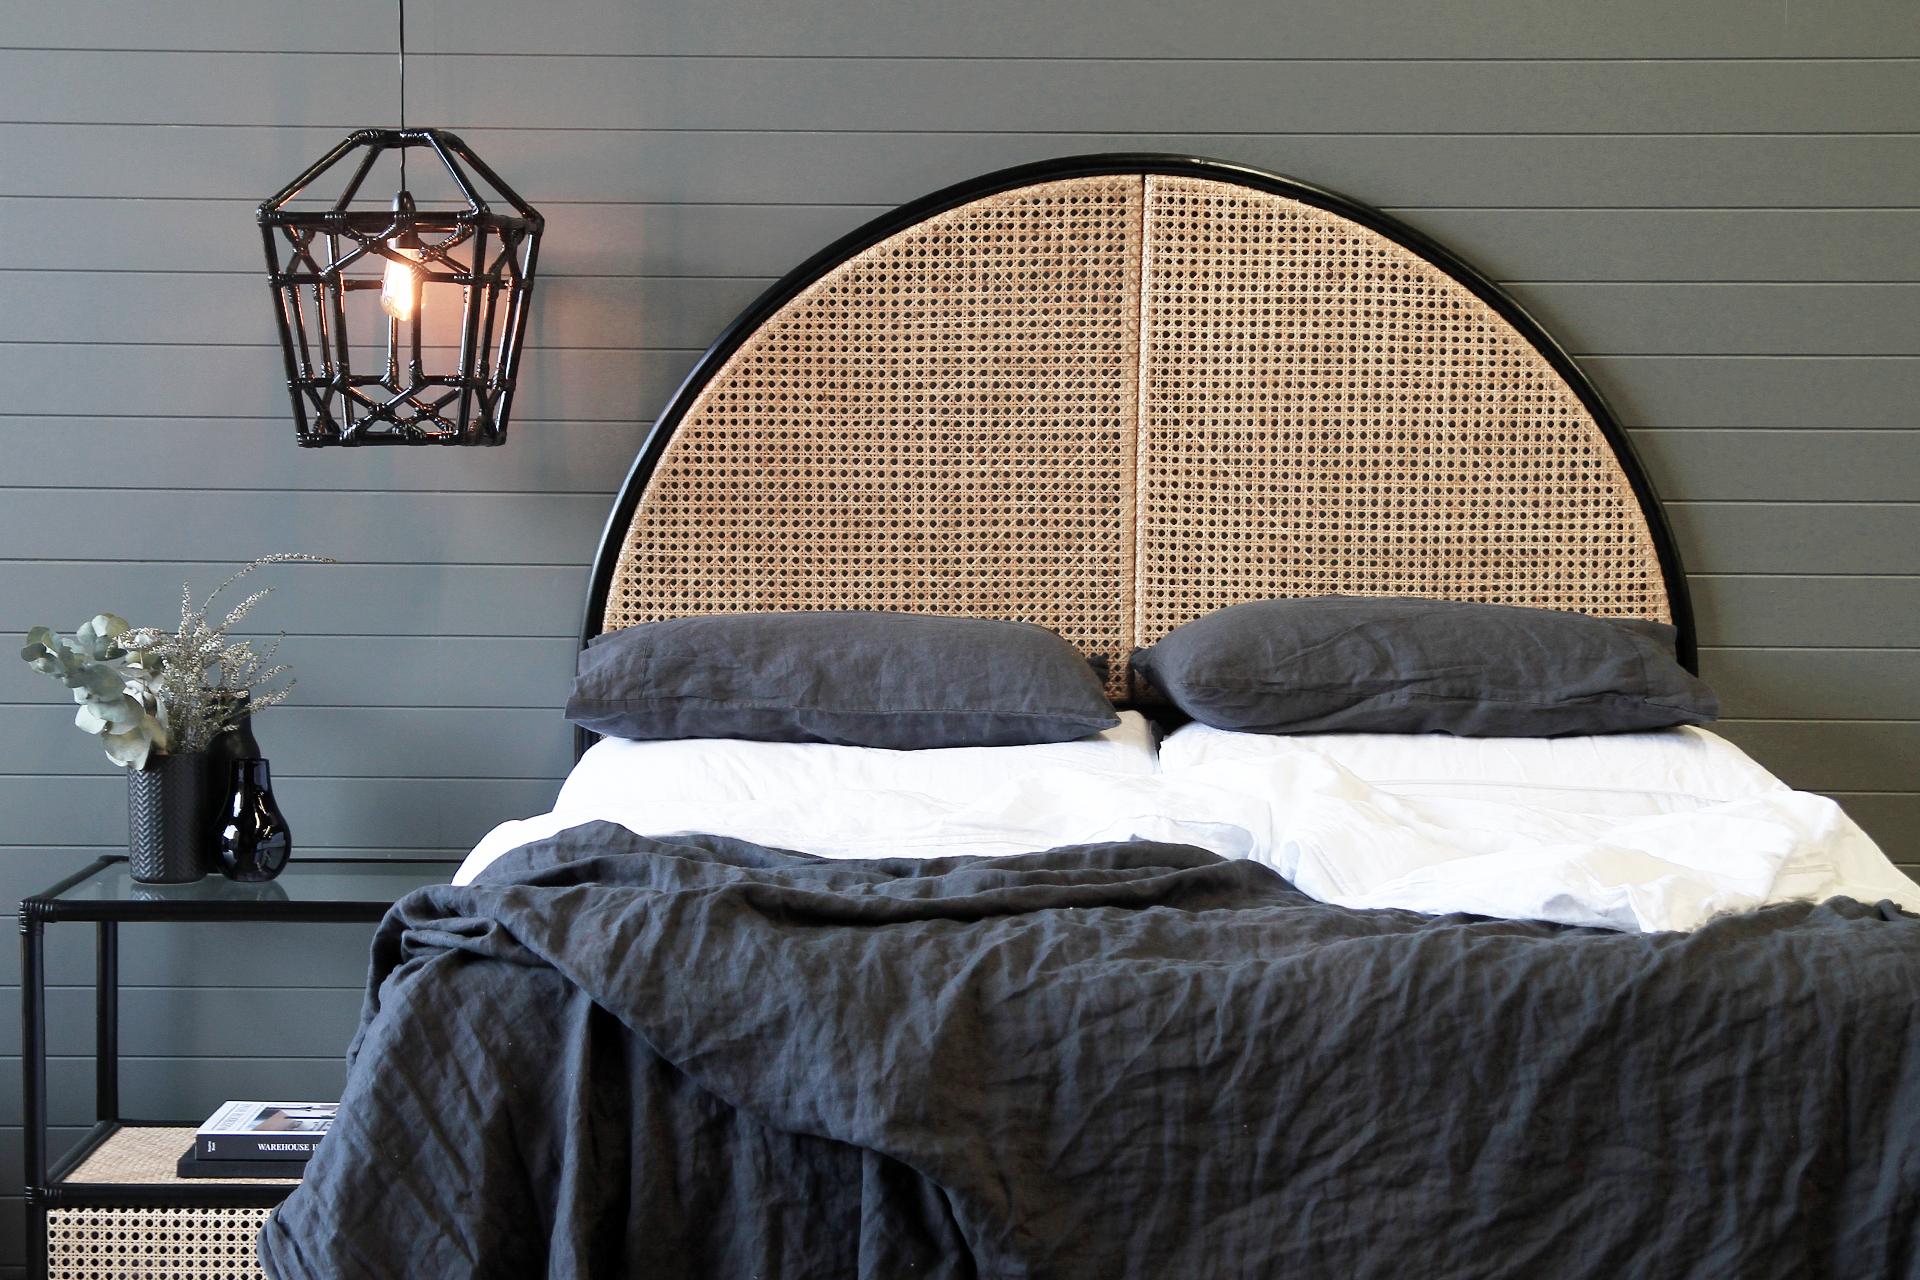 Serena Bedhead Naturally Cane Rattan And Wicker Furniture